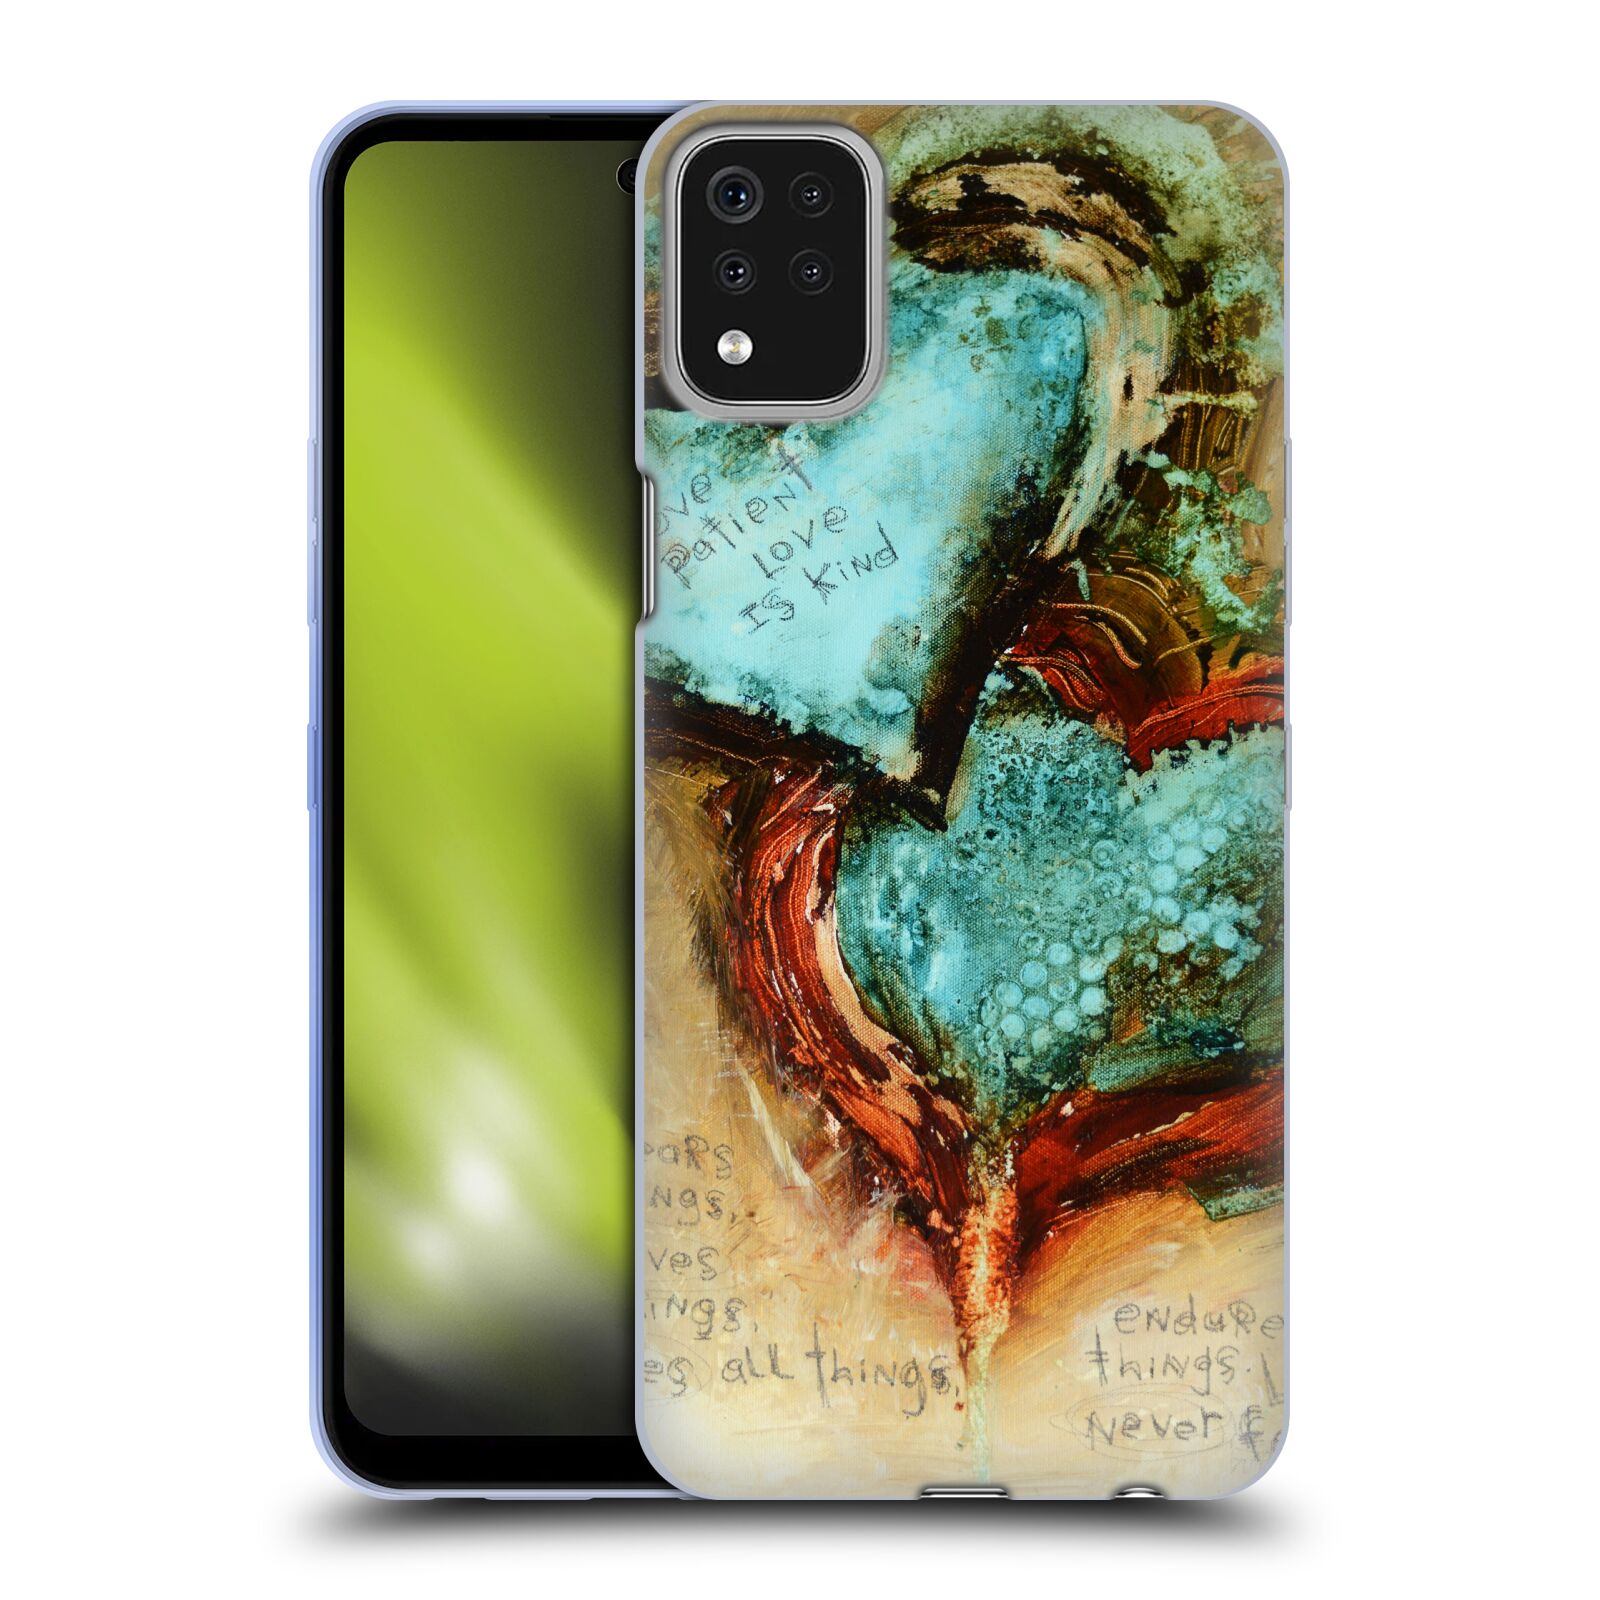 G8S ThinQ K22 K51S K61 Stylo 激安卸販売新品 6 Velvet 5G オフィシャル アブストラクト LG Michel Keck 電話 ソフトジェルケース 1 リリジャス メーカー公式ショップ